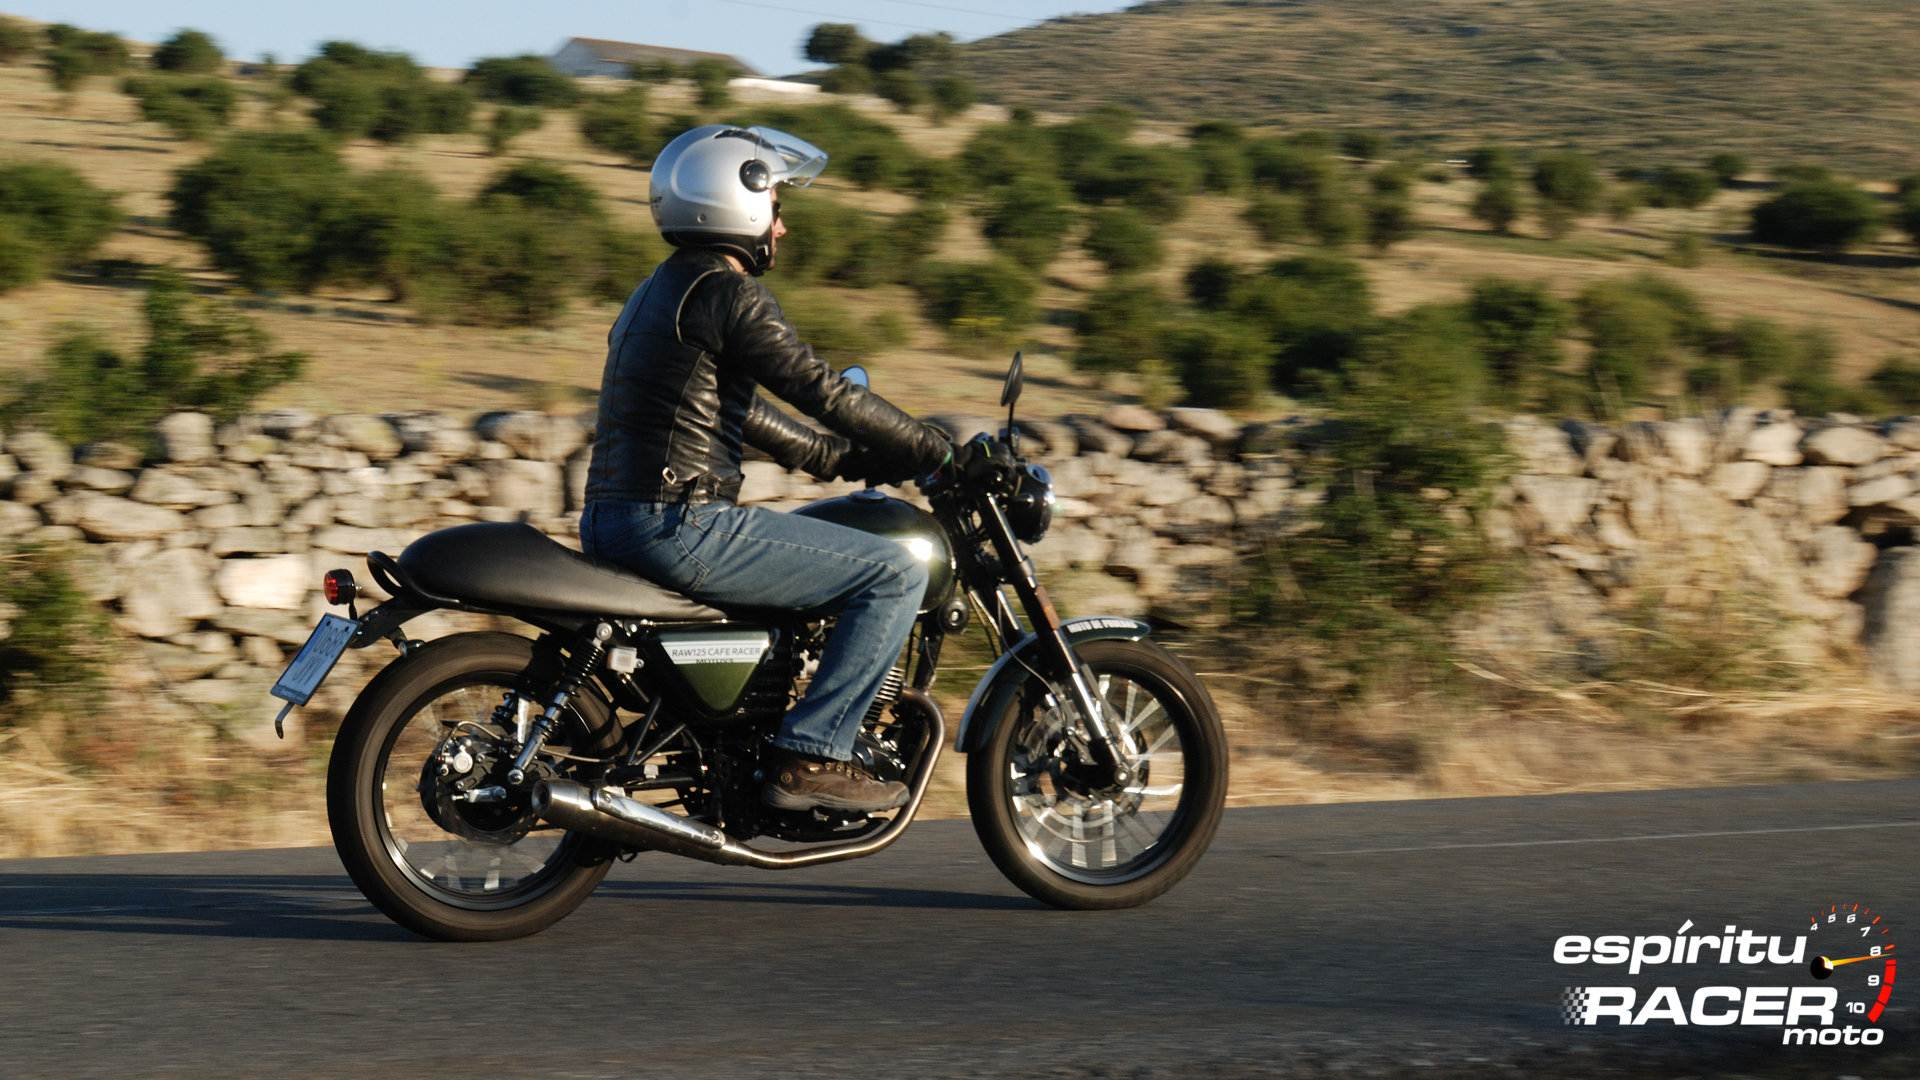 espíritu RACER Moto no cierra